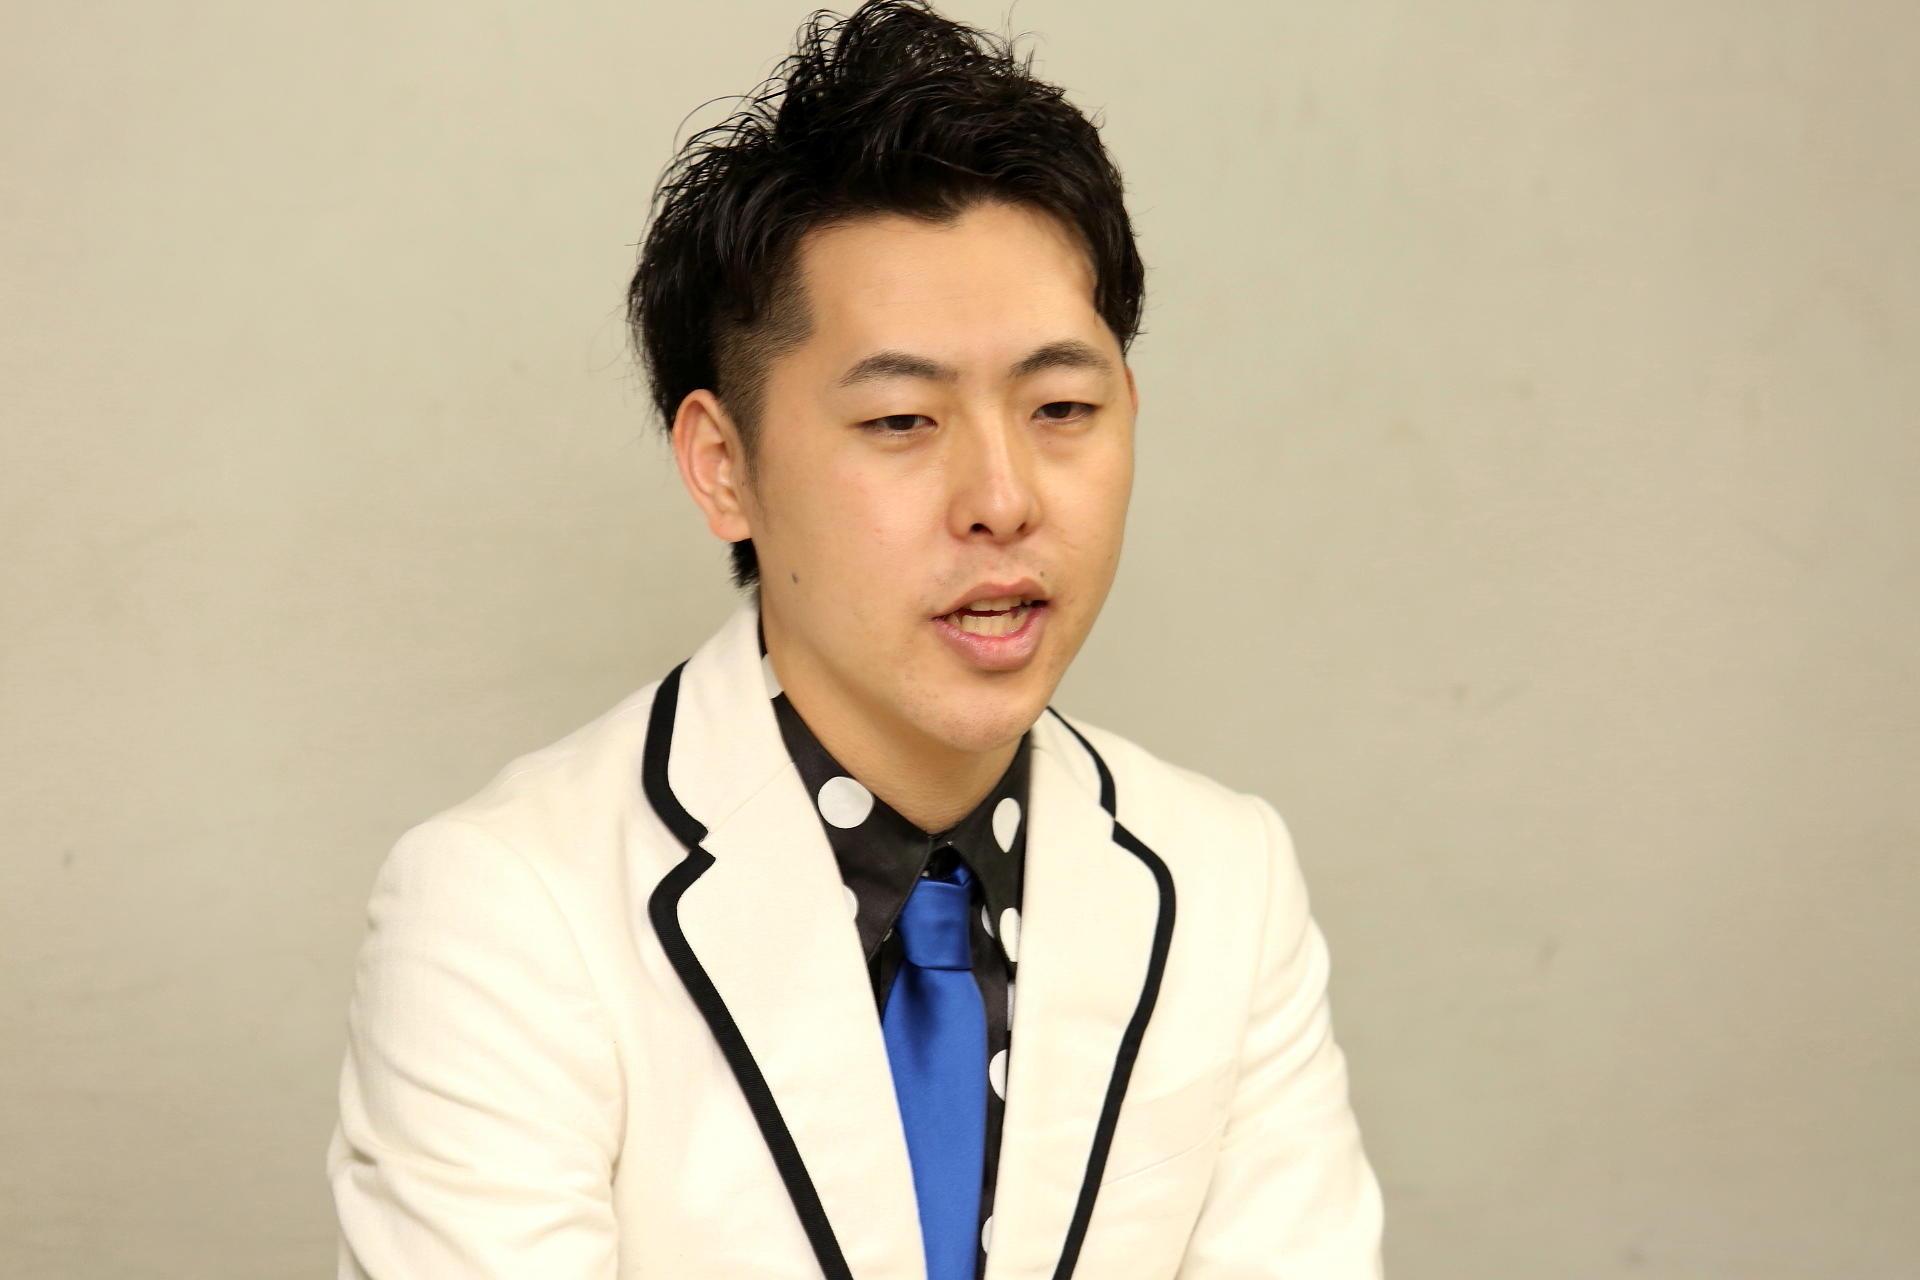 http://news.yoshimoto.co.jp/20170226202609-147898828ec7309c68d44c1ba62c71fdbe97a902.jpg